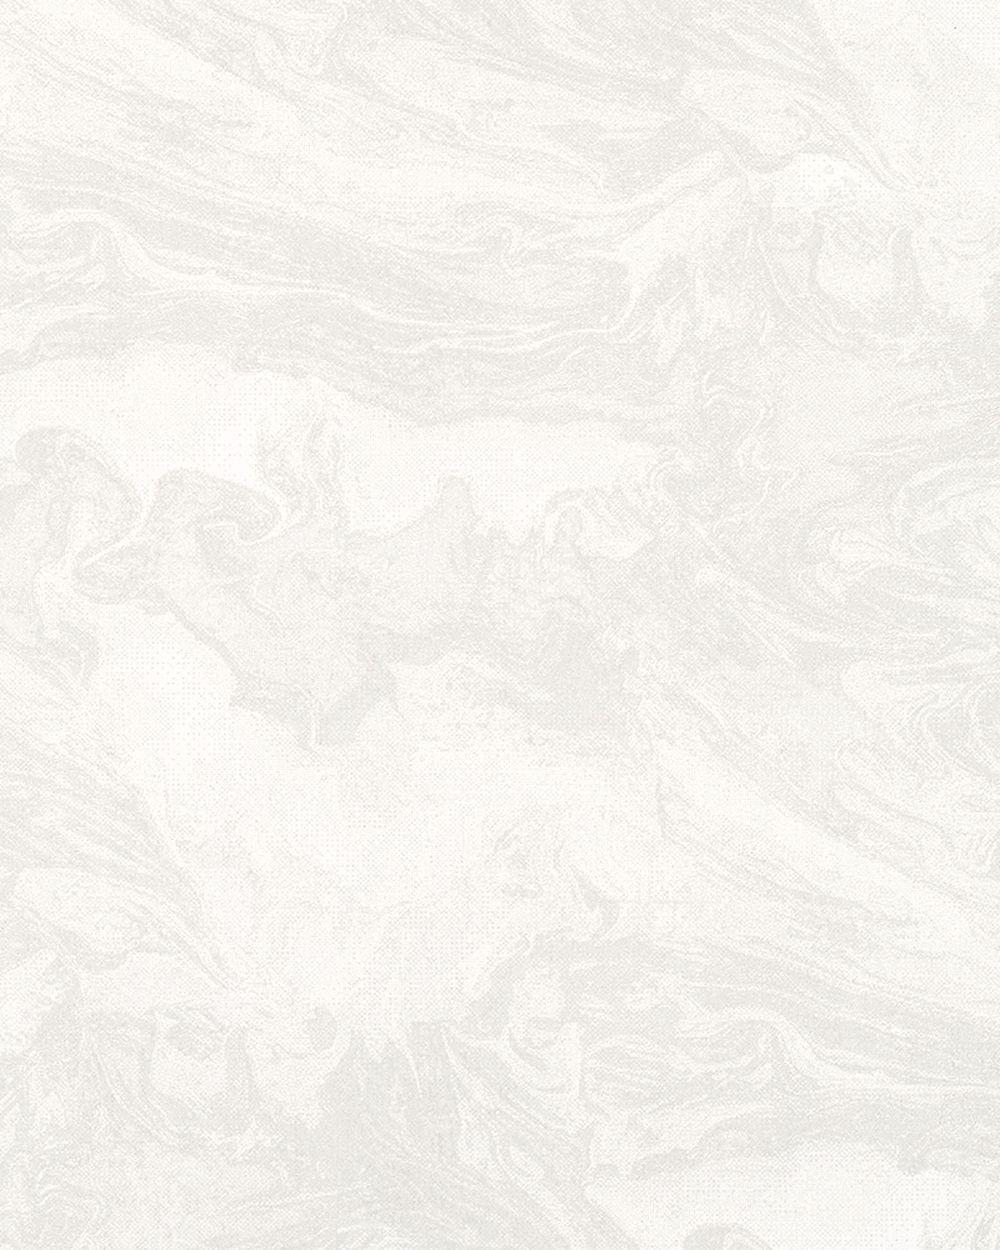 vliestapete marmor vintage wei grau glanz marburg 59412. Black Bedroom Furniture Sets. Home Design Ideas